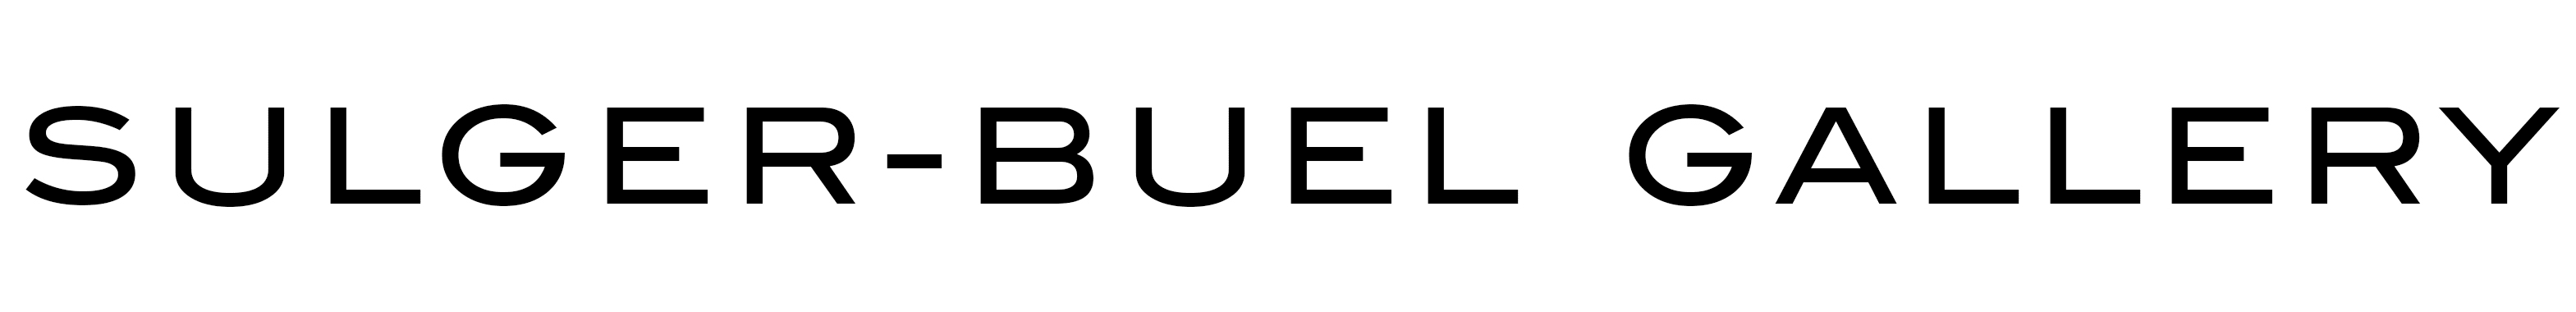 Sulger-Buel Gallery company logo